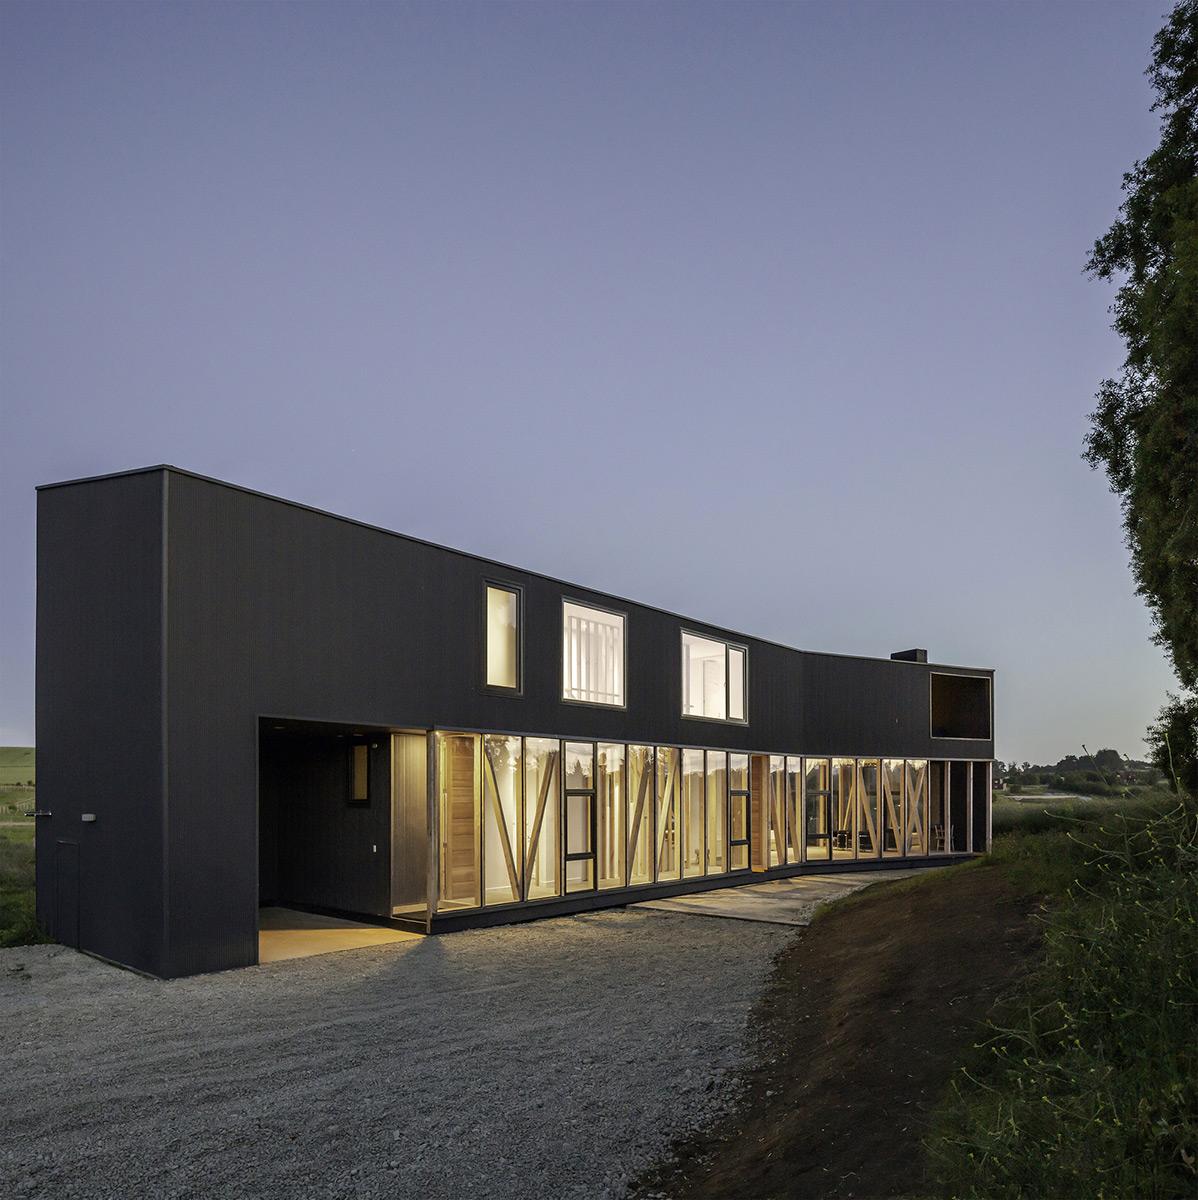 Casa-Maitenes-Ignacio-Correa-Aryeh-Kornfled-06